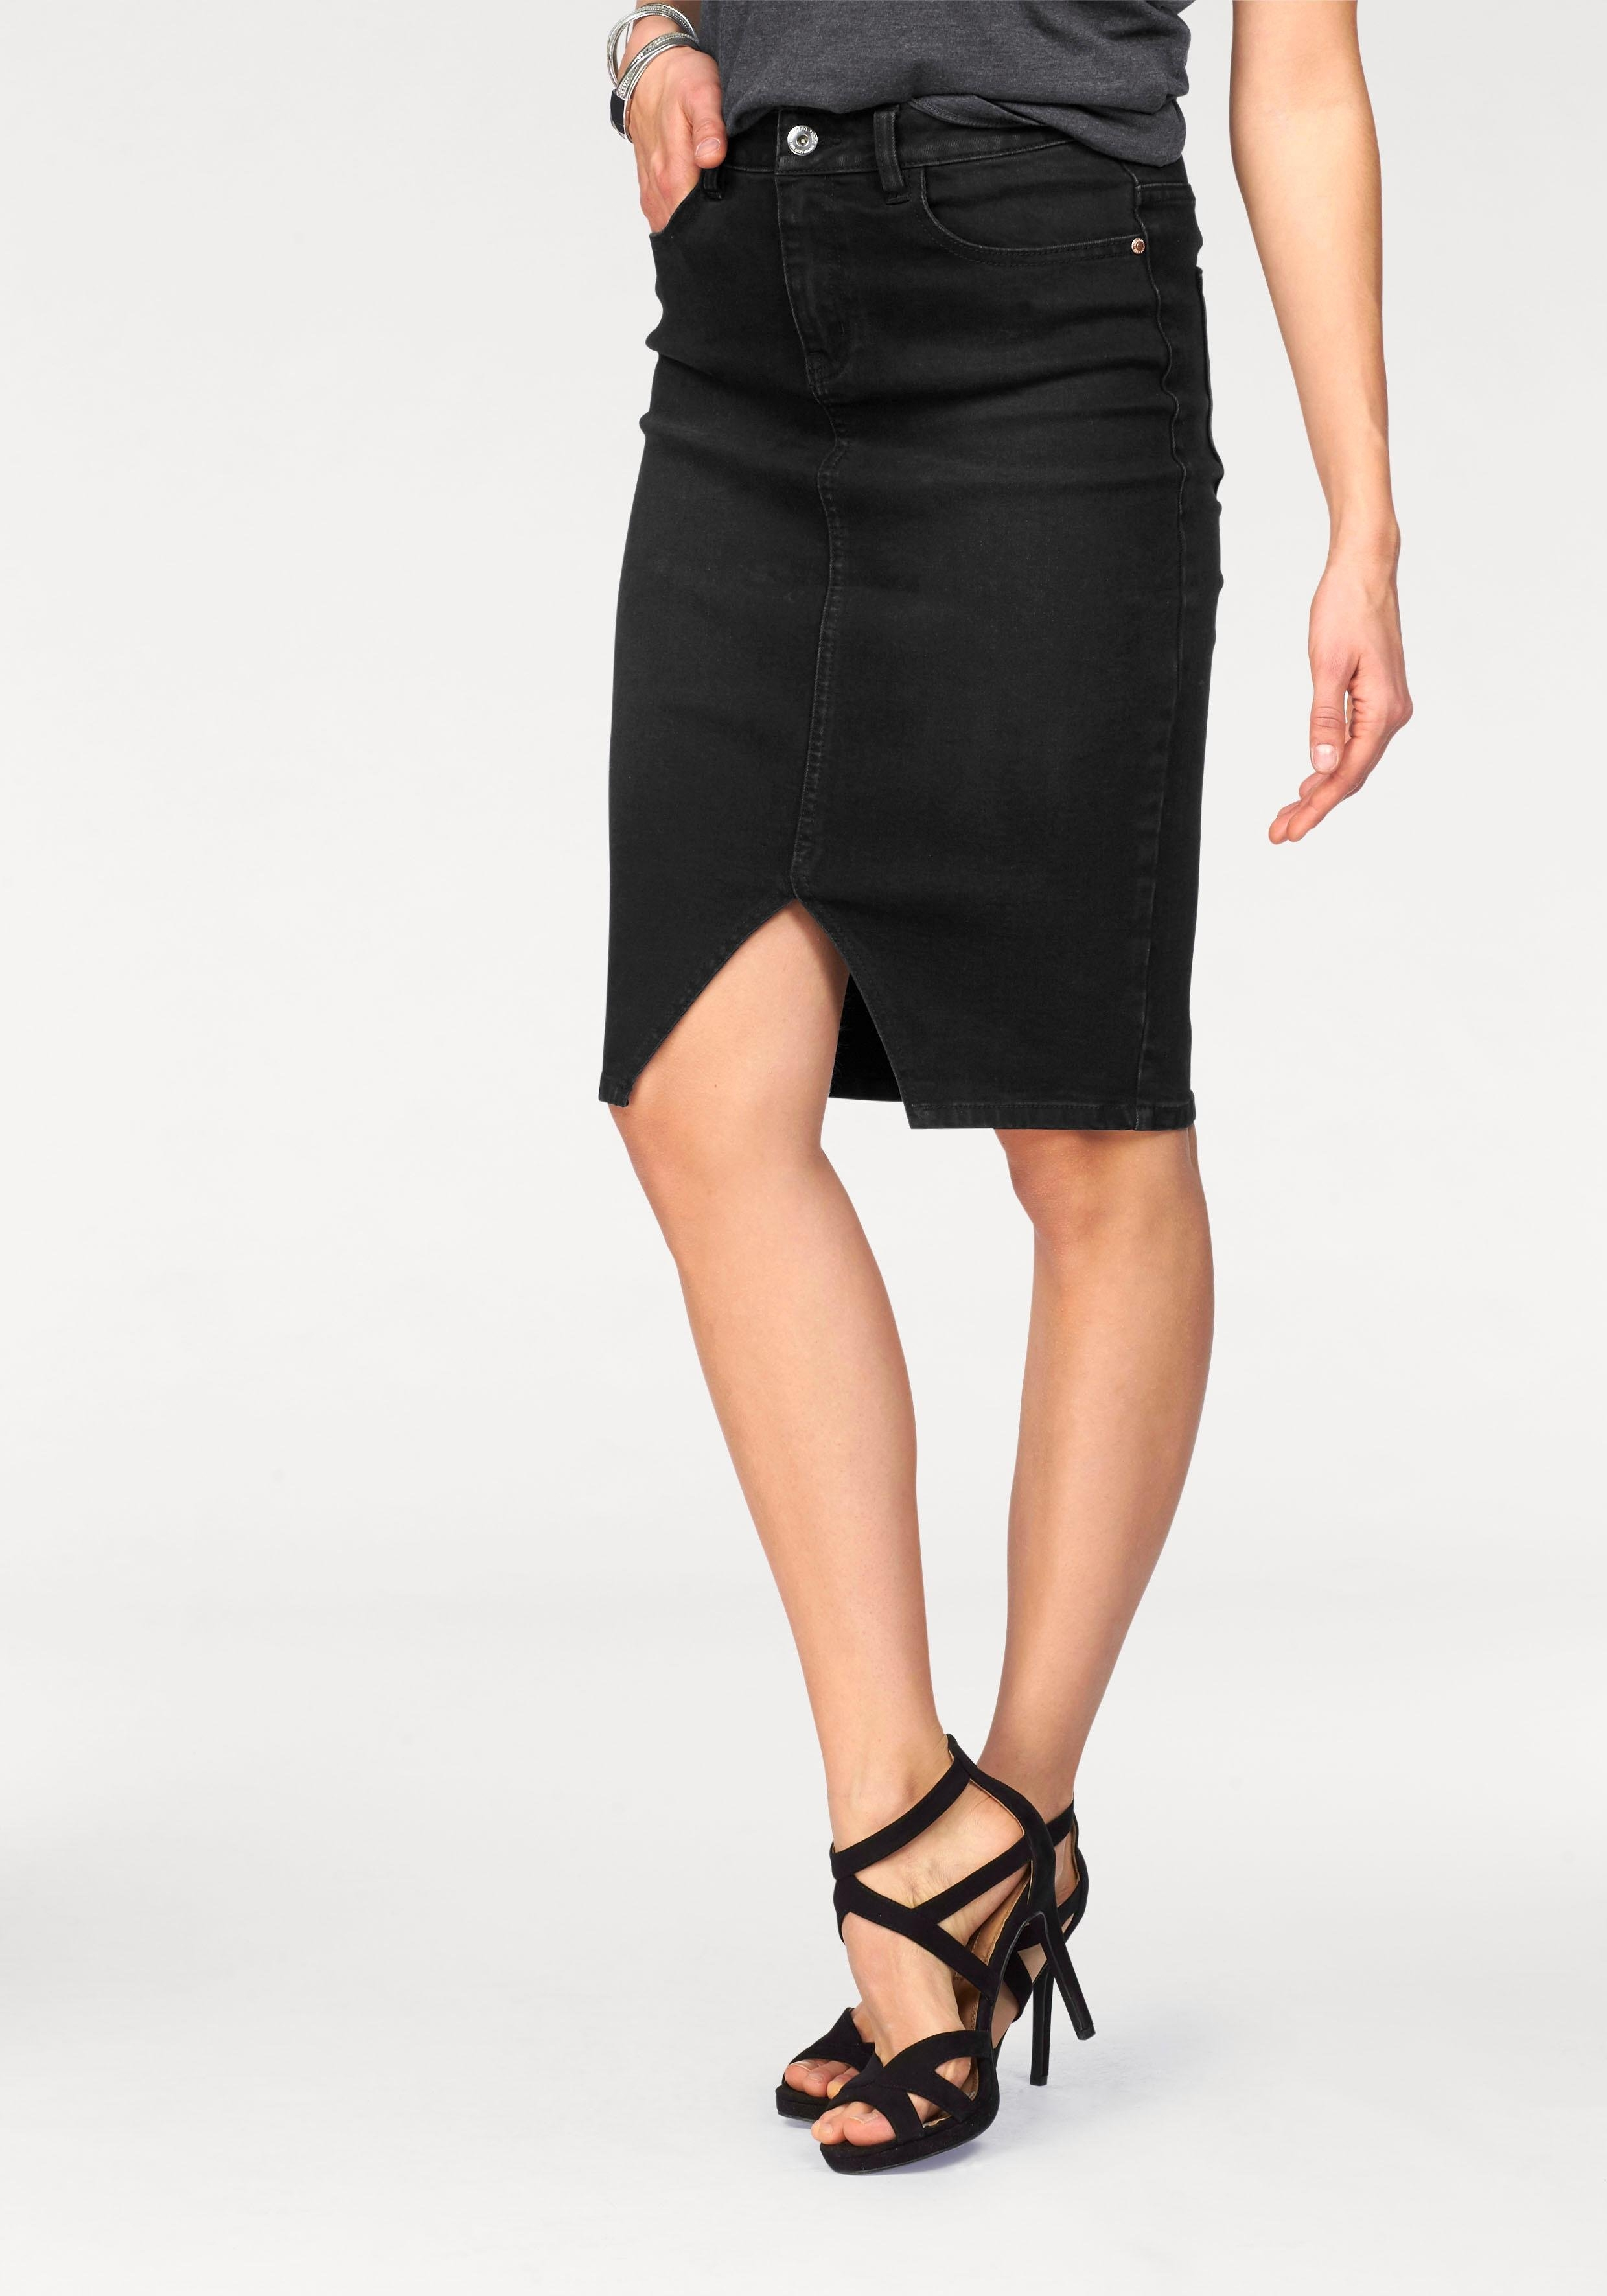 VERO MODA jeansrok »SUSANNA« bij OTTO online kopen